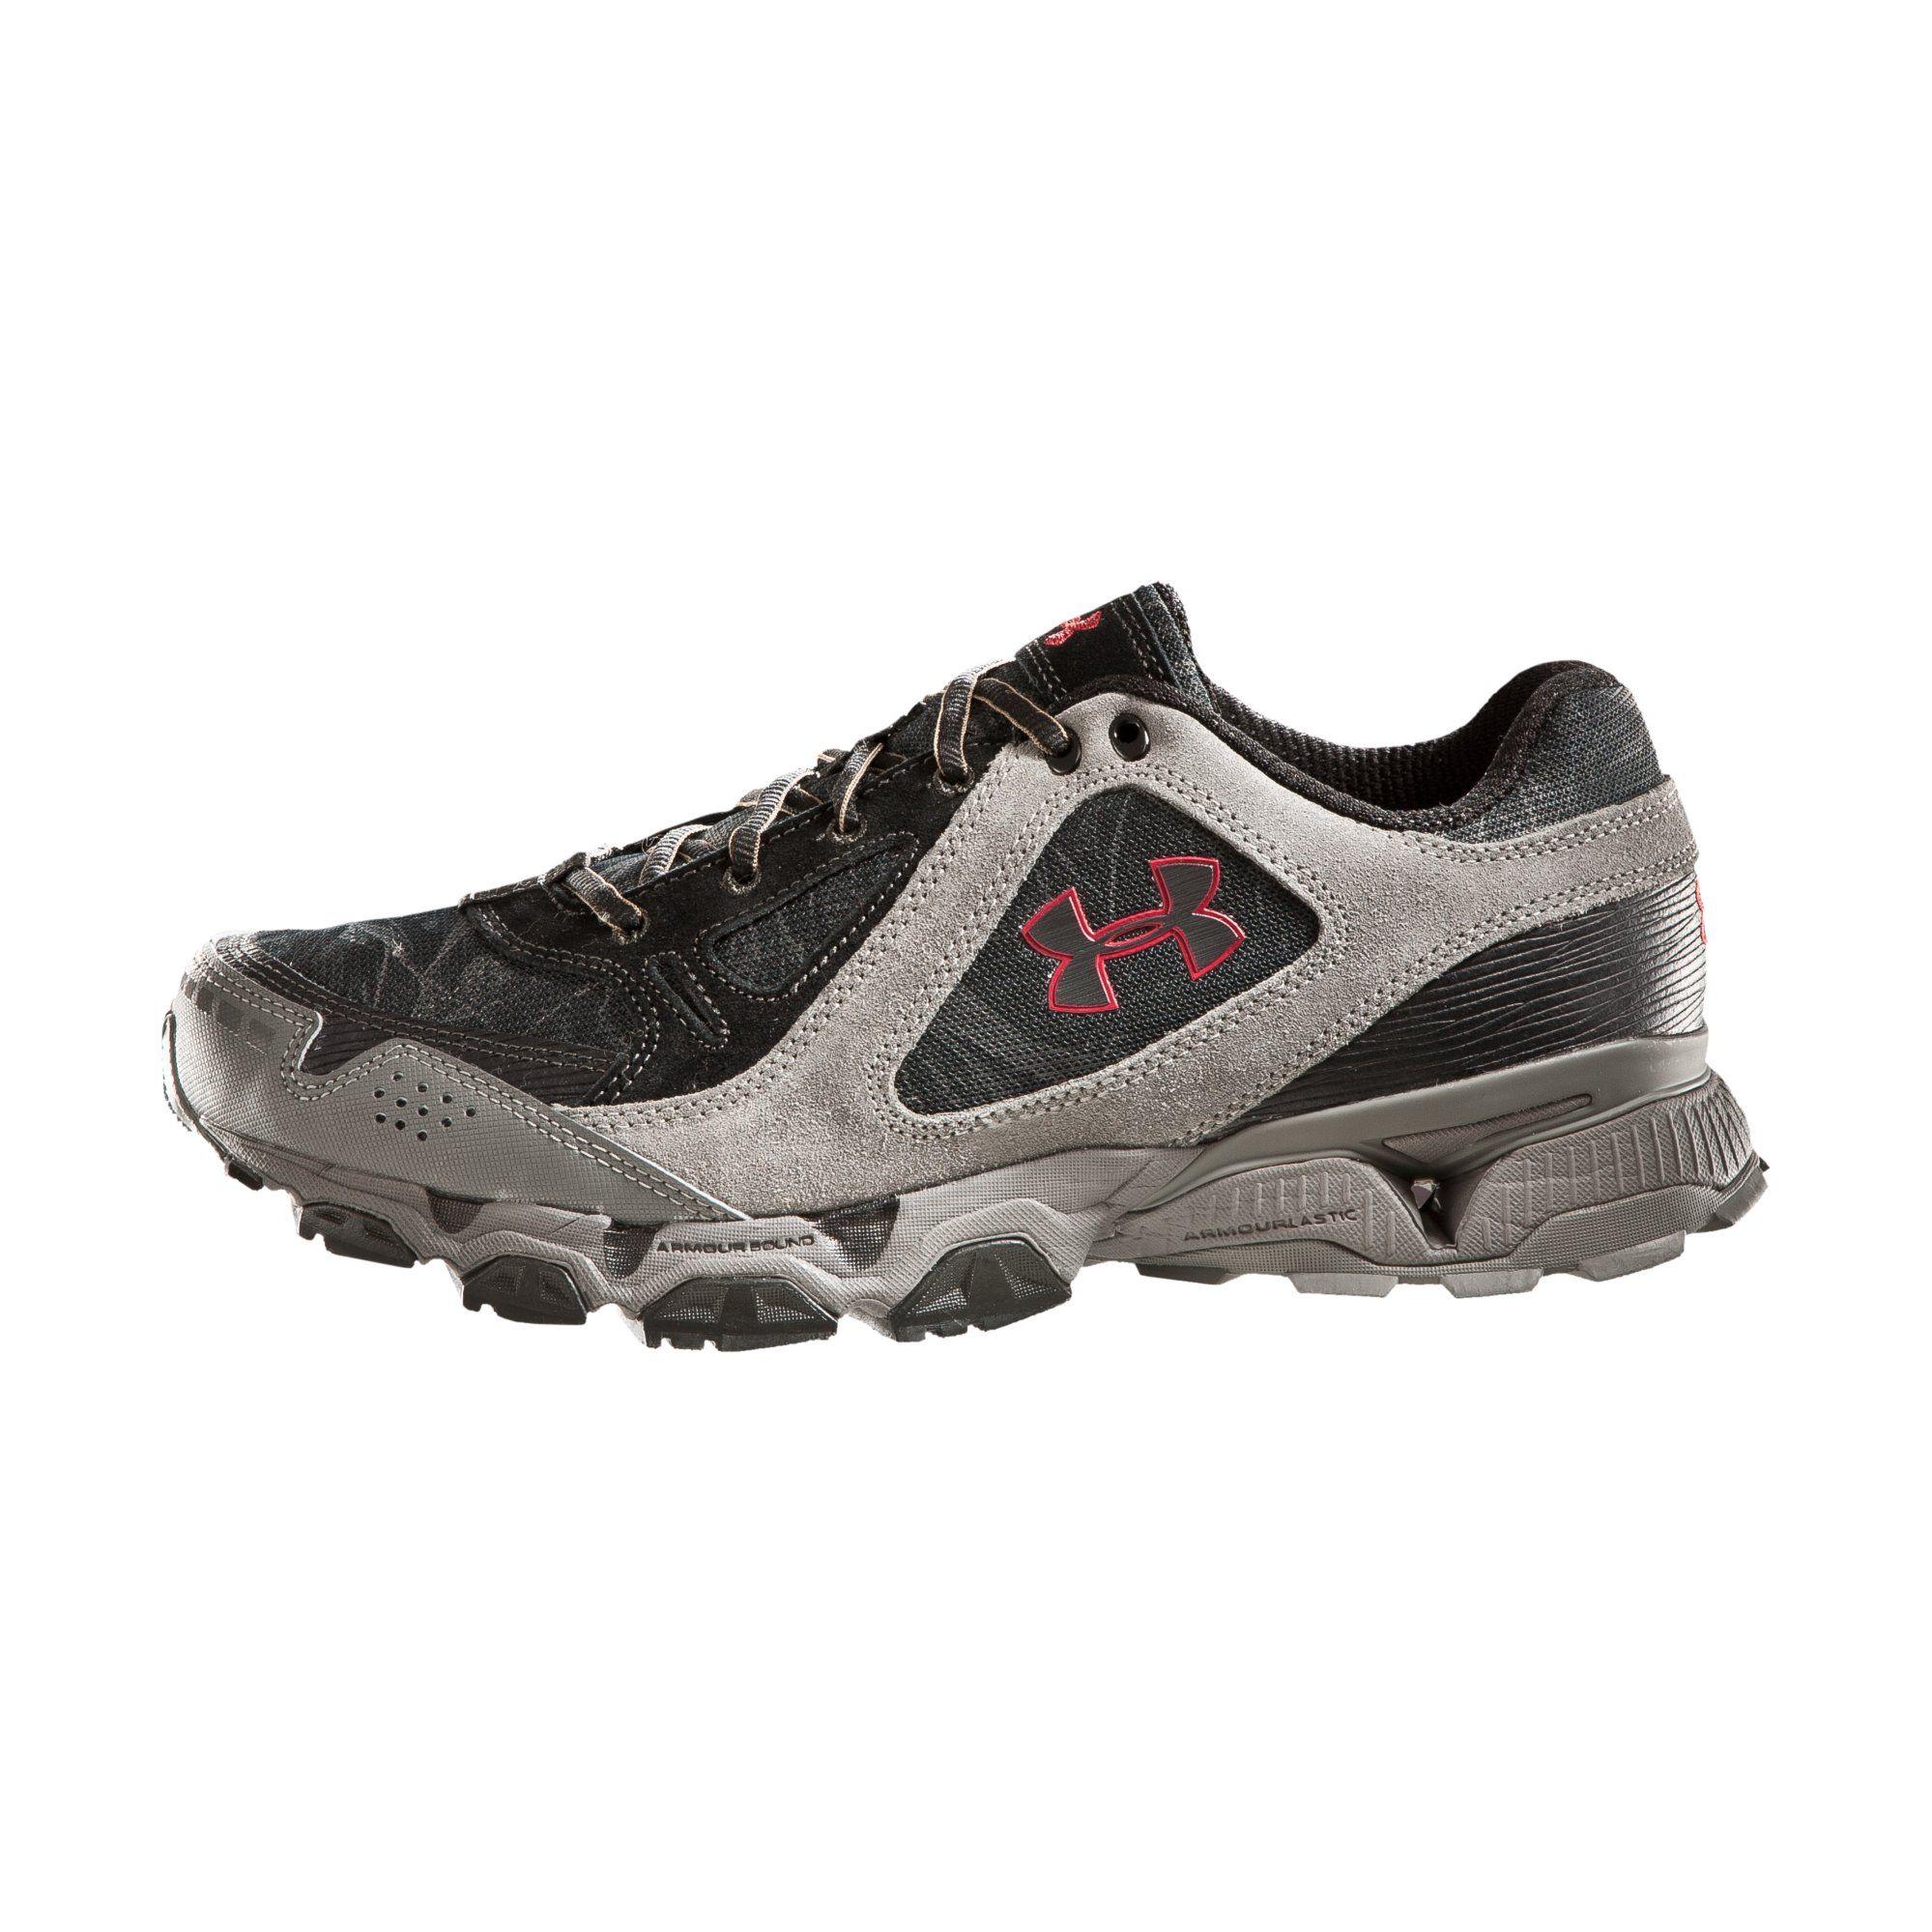 Under Armour Men S Chetco Ii Trail Running Shoes Running Armour Under Trail Chetco Shoes Running Ii Un In 2020 Trail Running Schuhe Sneakers Mode Stollenschuhe